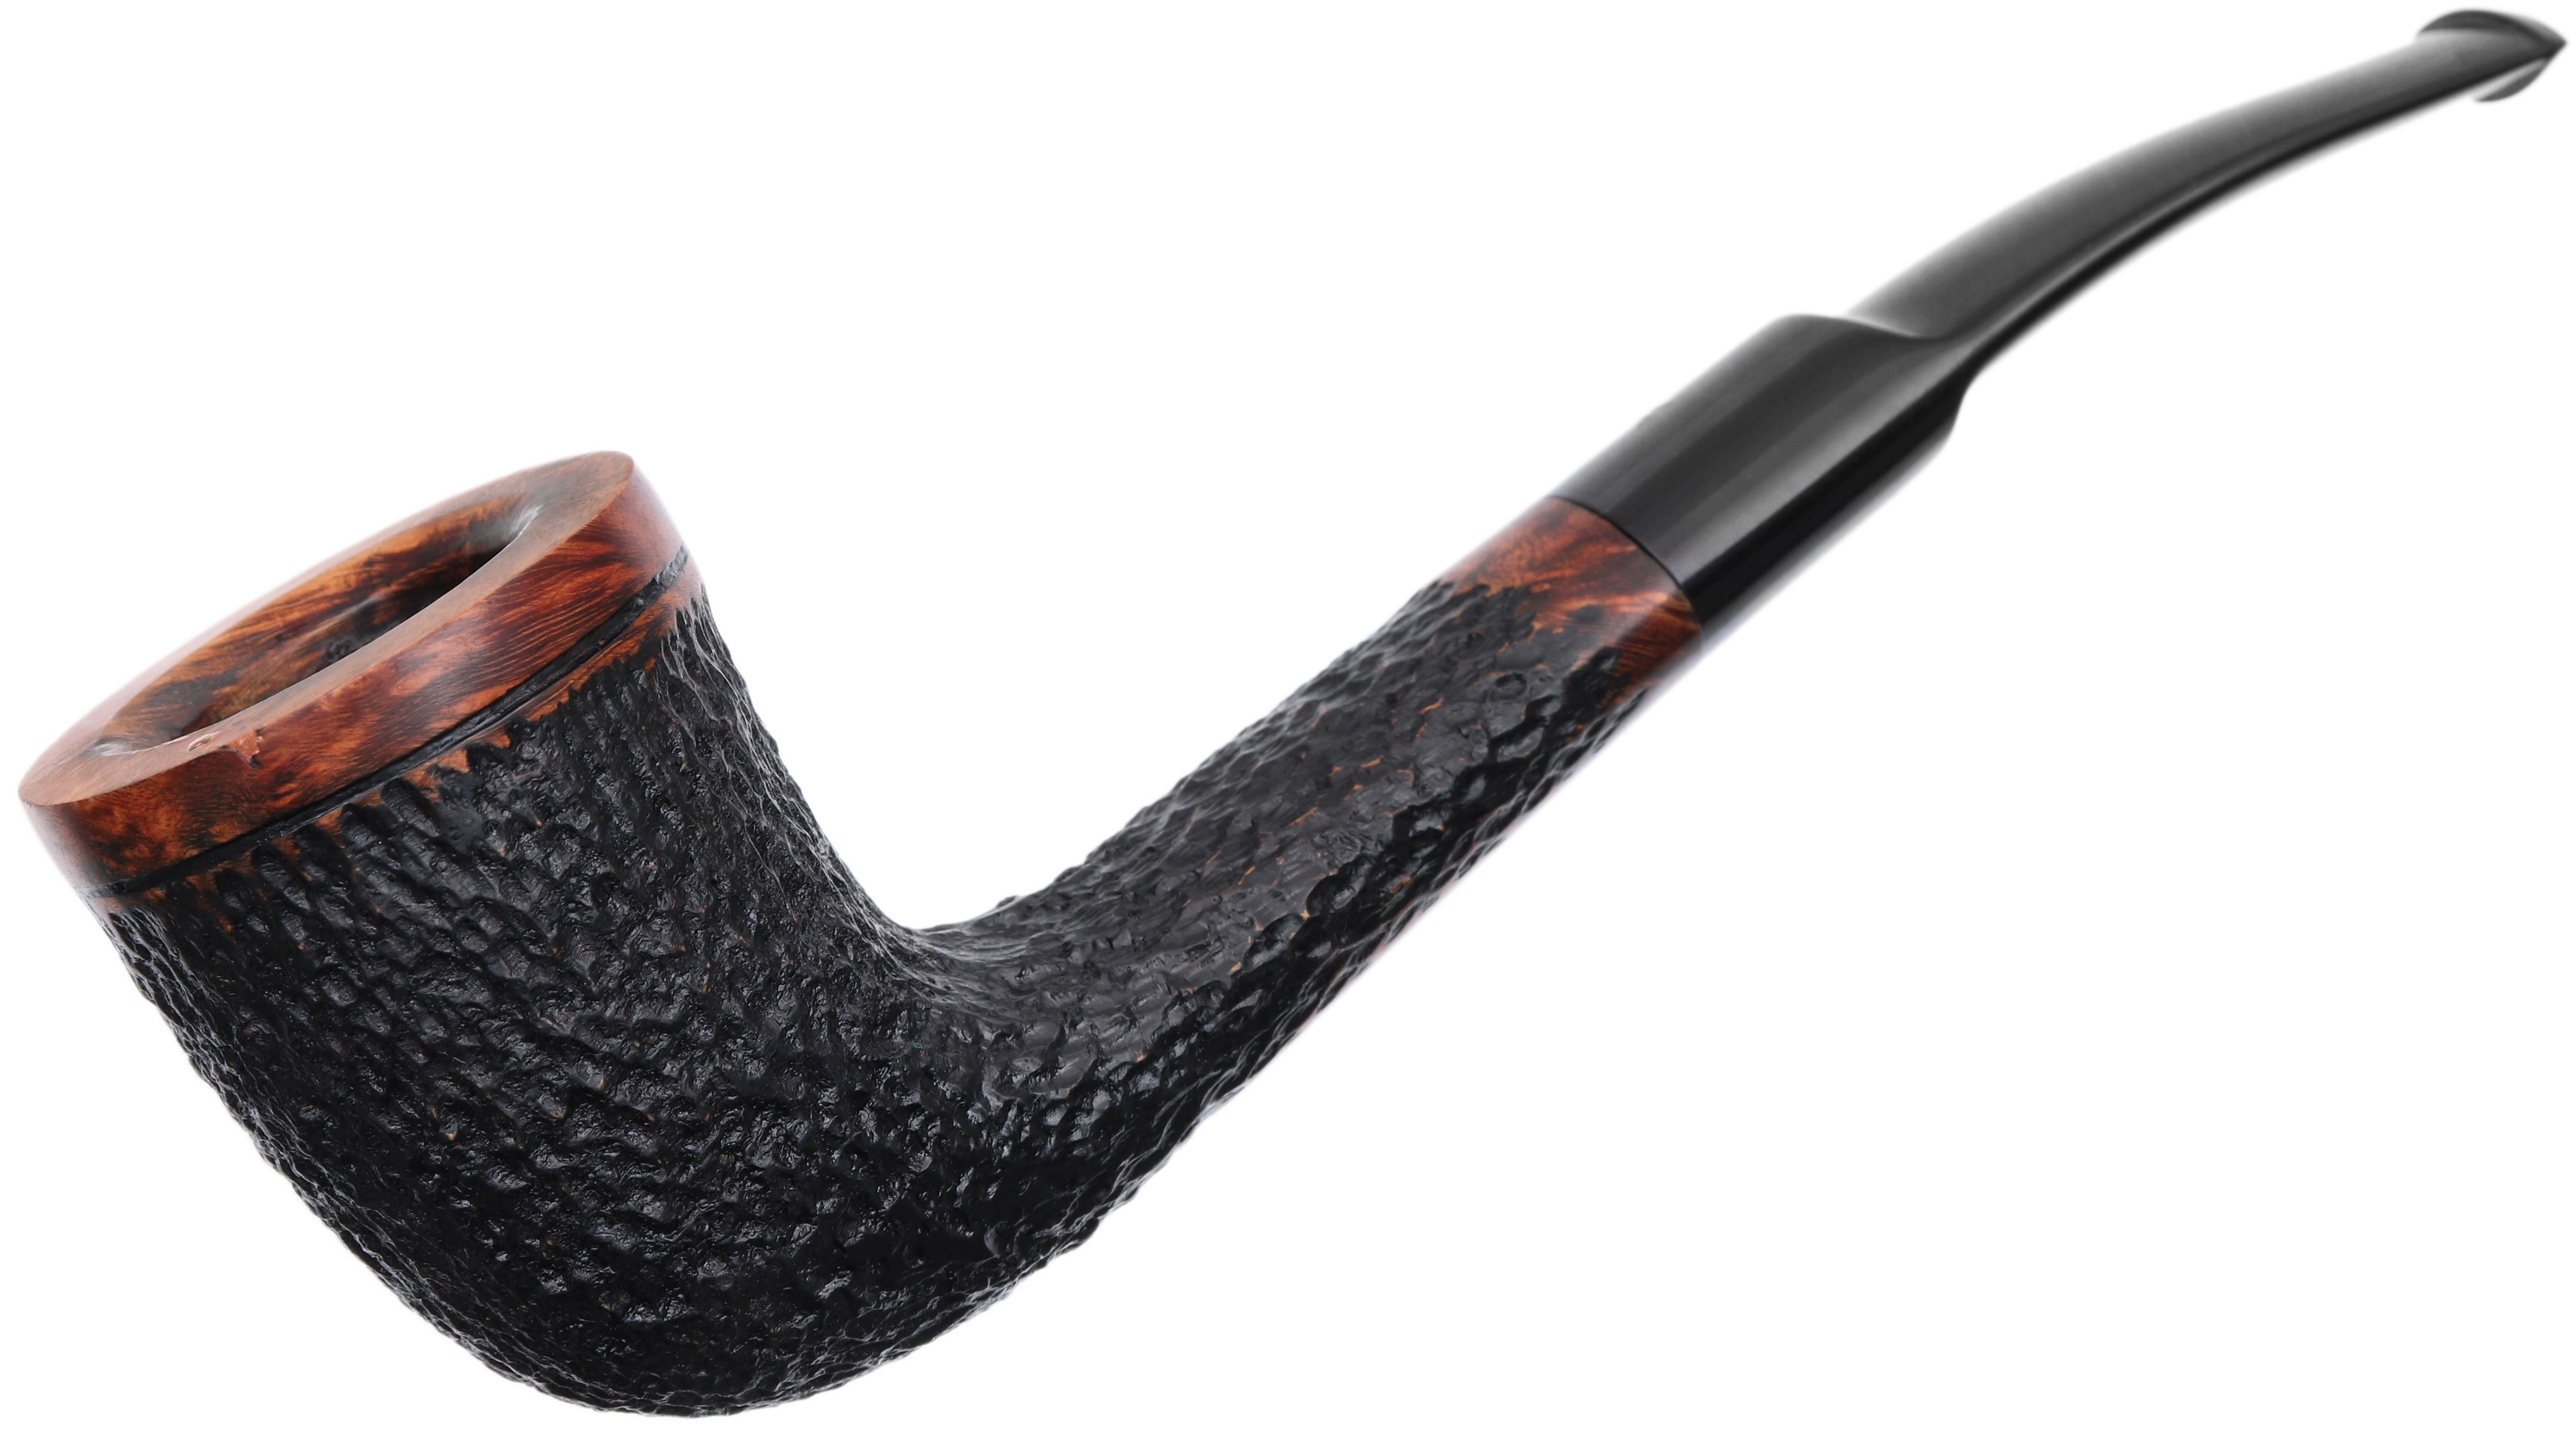 Misc. Estates Fumo Small Cut Partially Rusticated Bent Dublin (402)